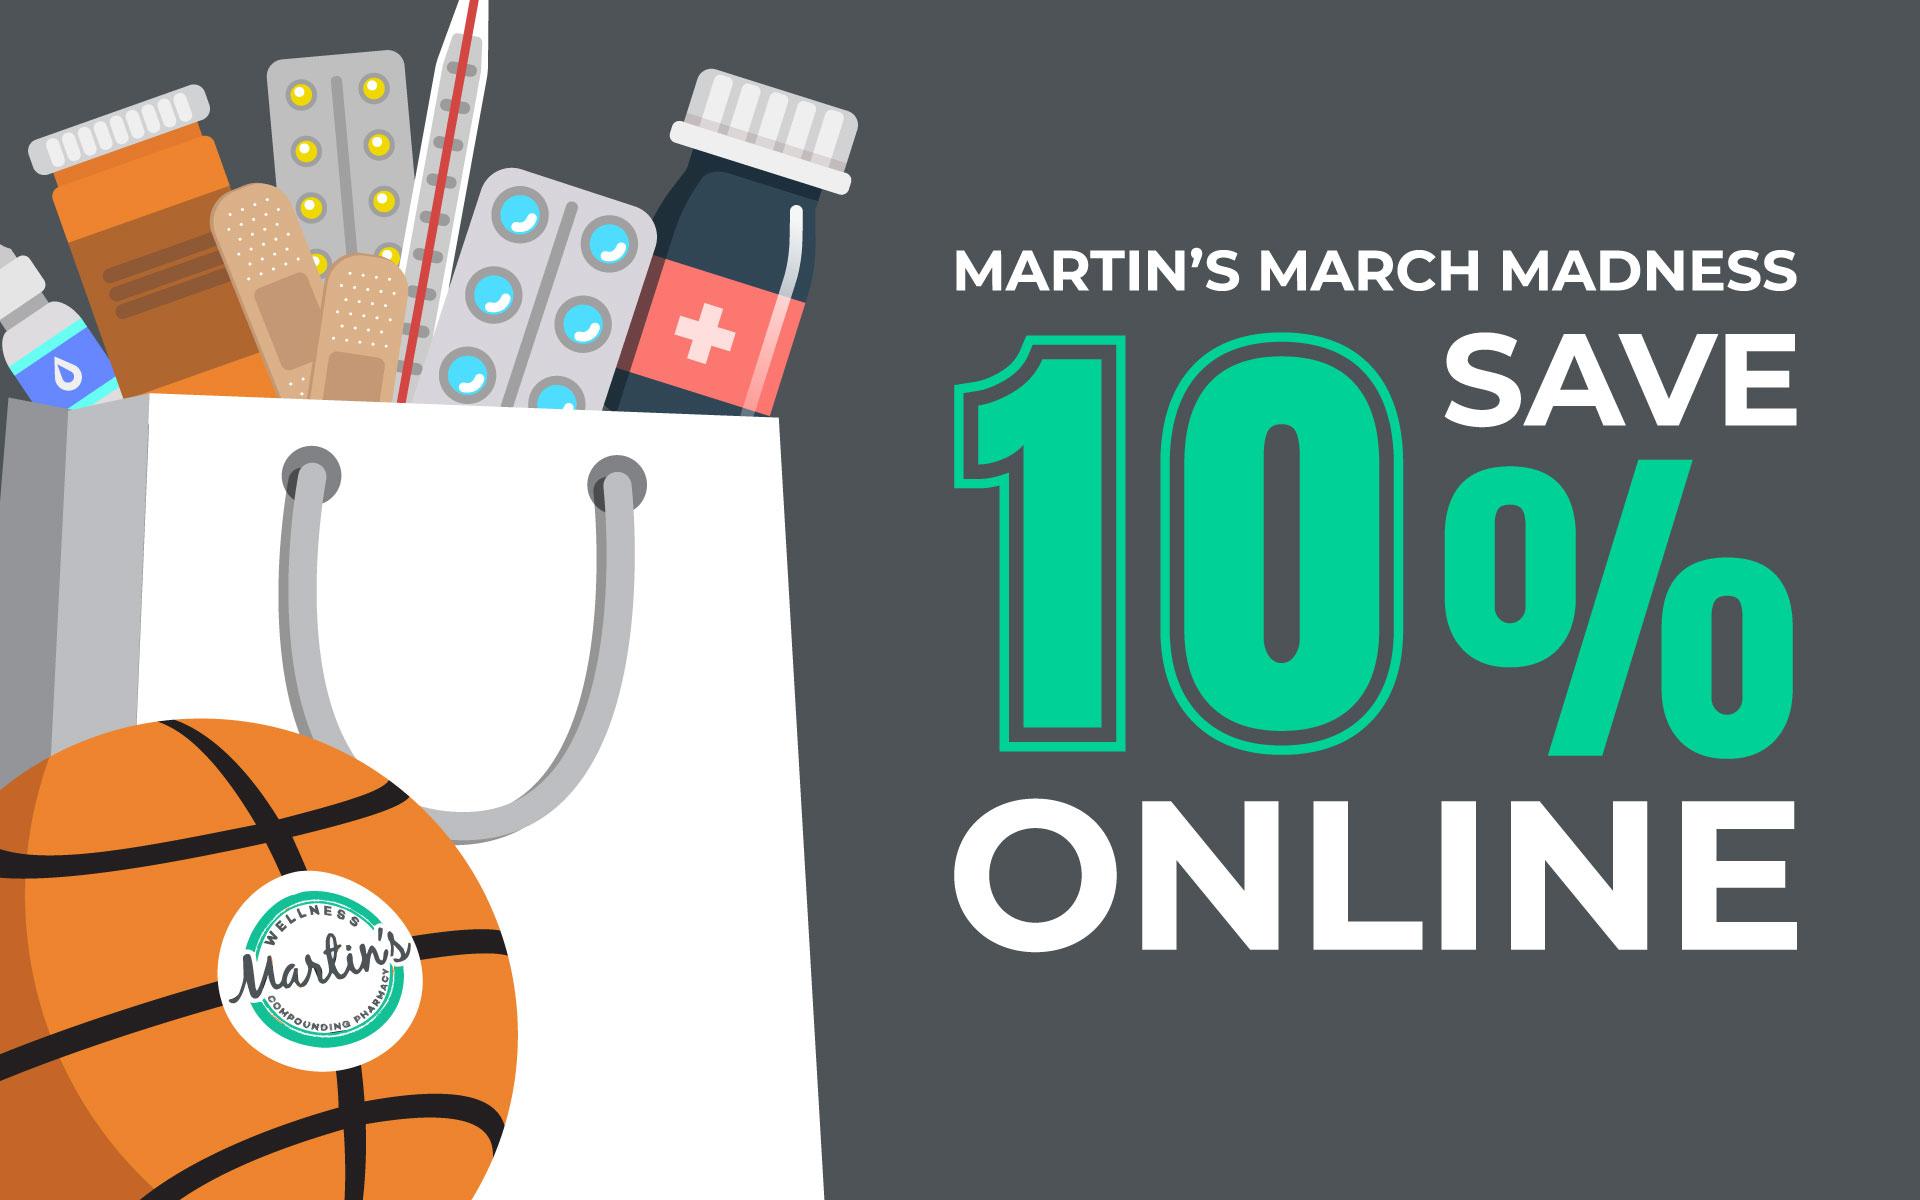 Martin's March Madness Graphic